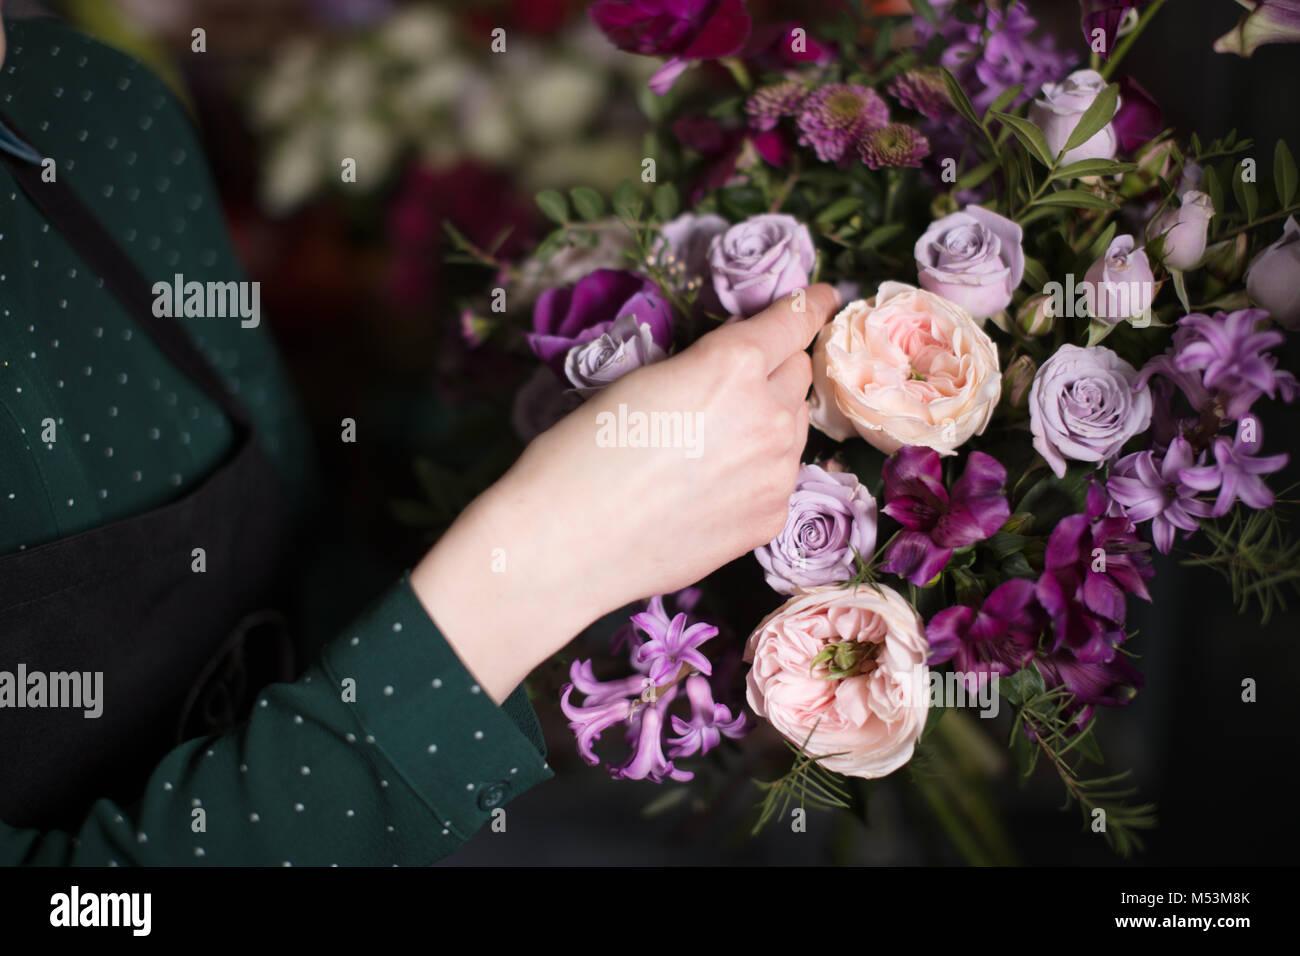 Proveedor joven tocar hermosas rosas en shop Imagen De Stock